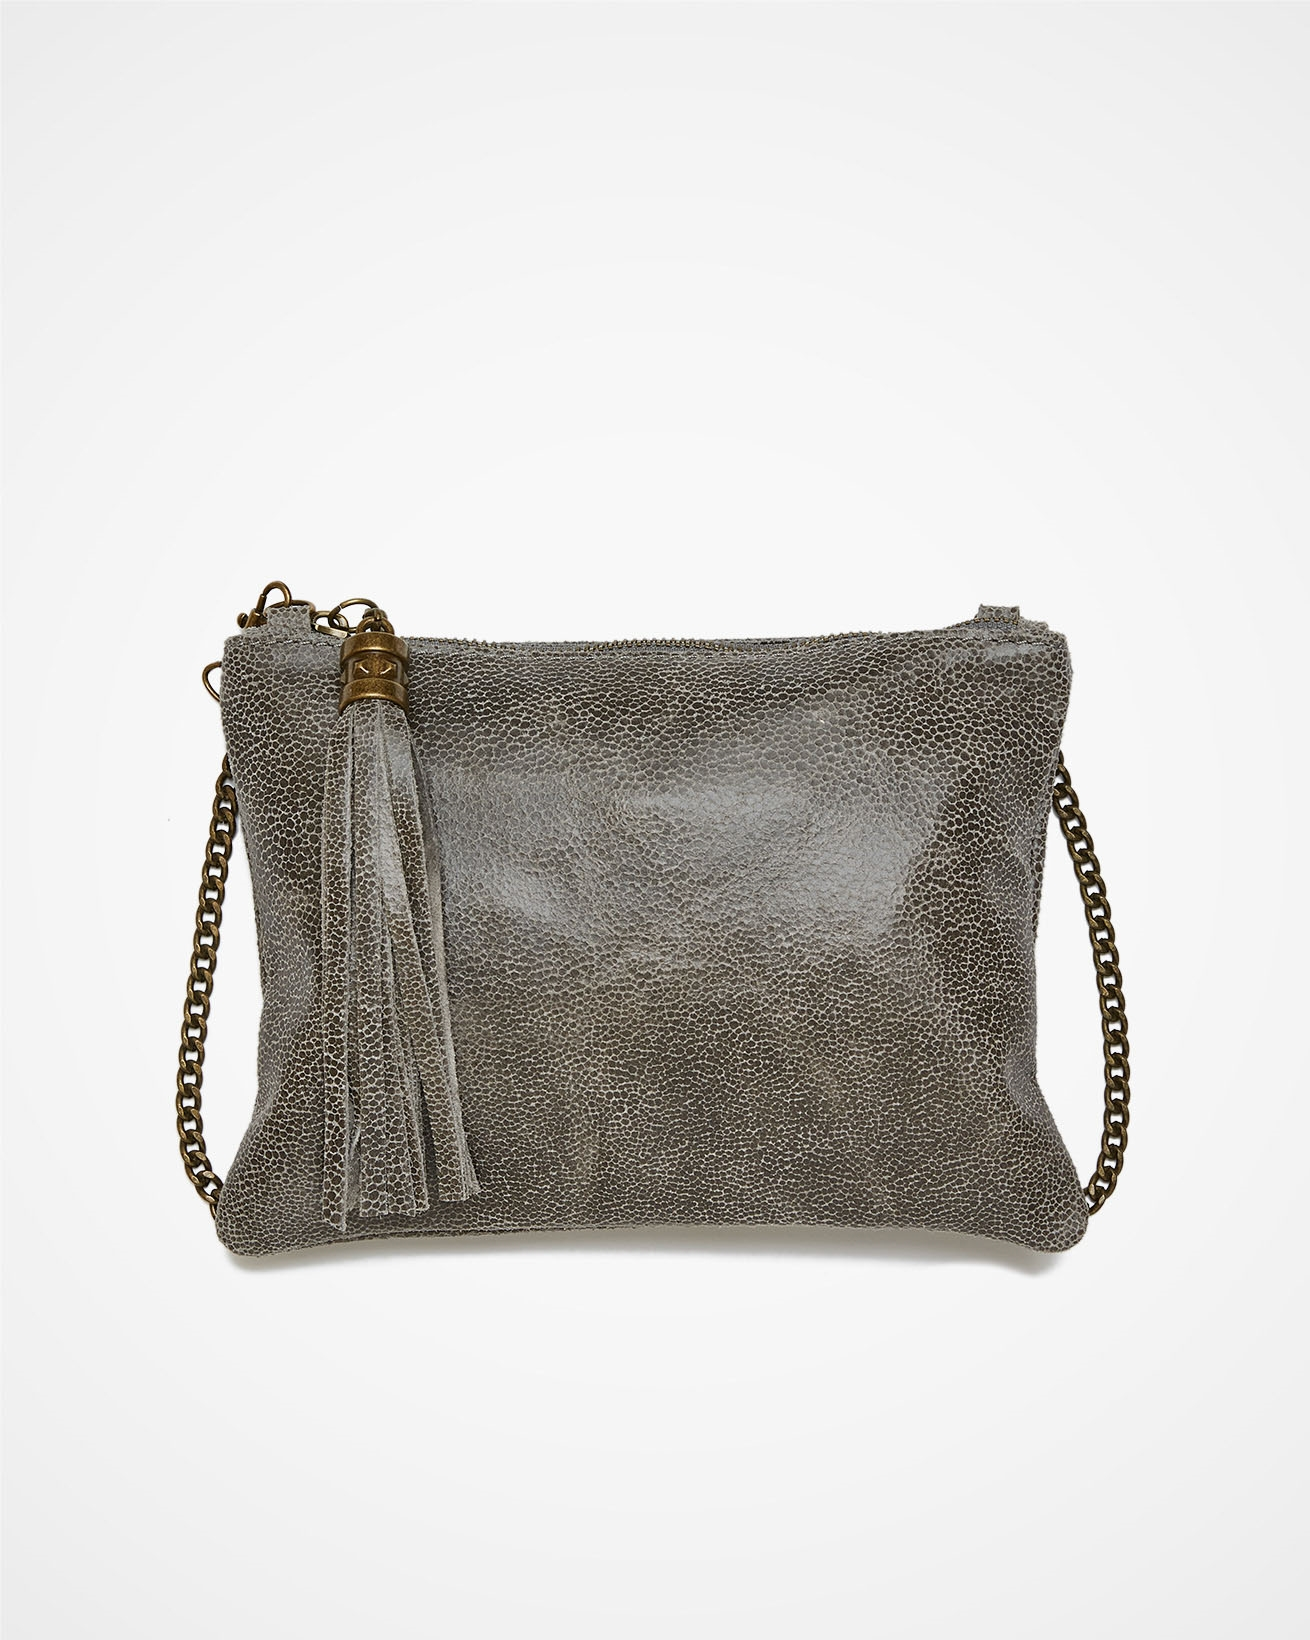 7735_vintage-suede-clutch-bag_derby-grey_front_cutout_web.jpg